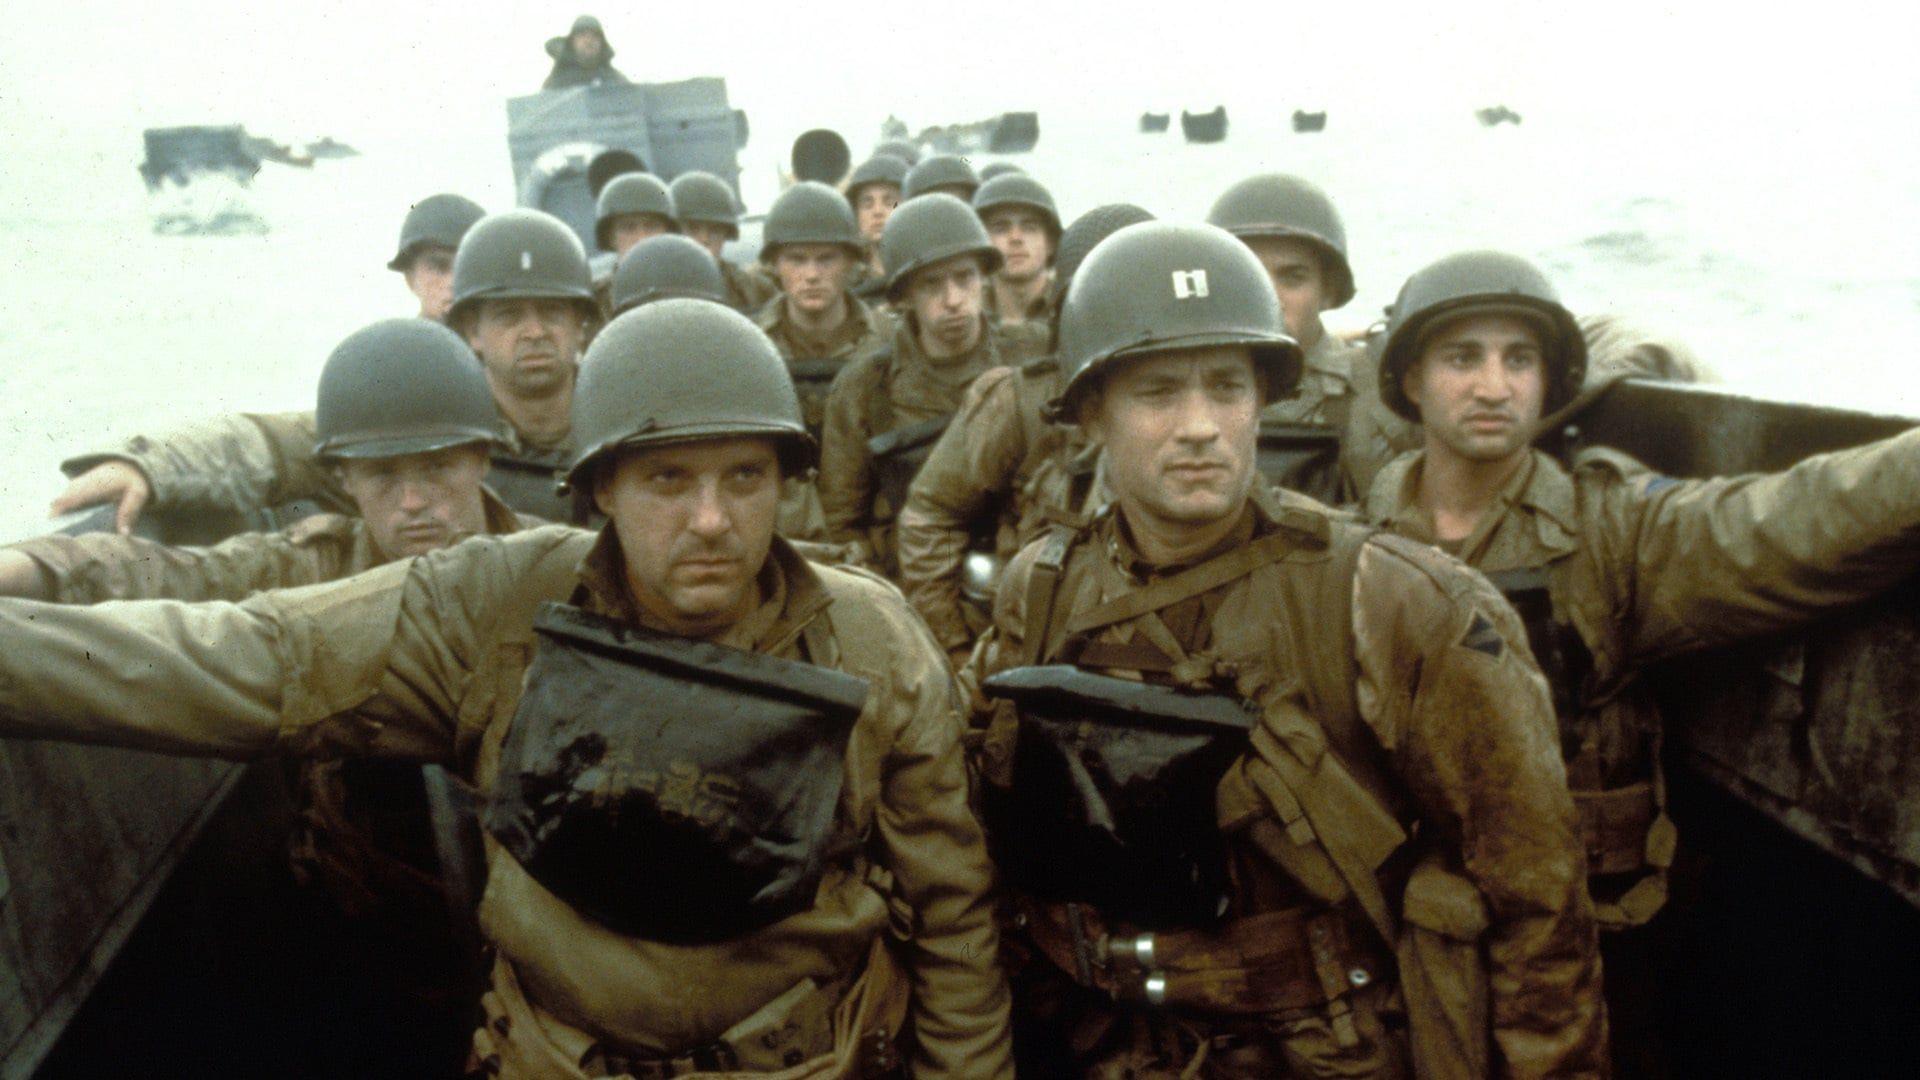 Saving Private Ryan 1998 Full Movie Hd Quality Enjoy Full Movie Click Link Below 100 Secure Http Streaming Marhunmovie Com Pejuang Film Film Perang